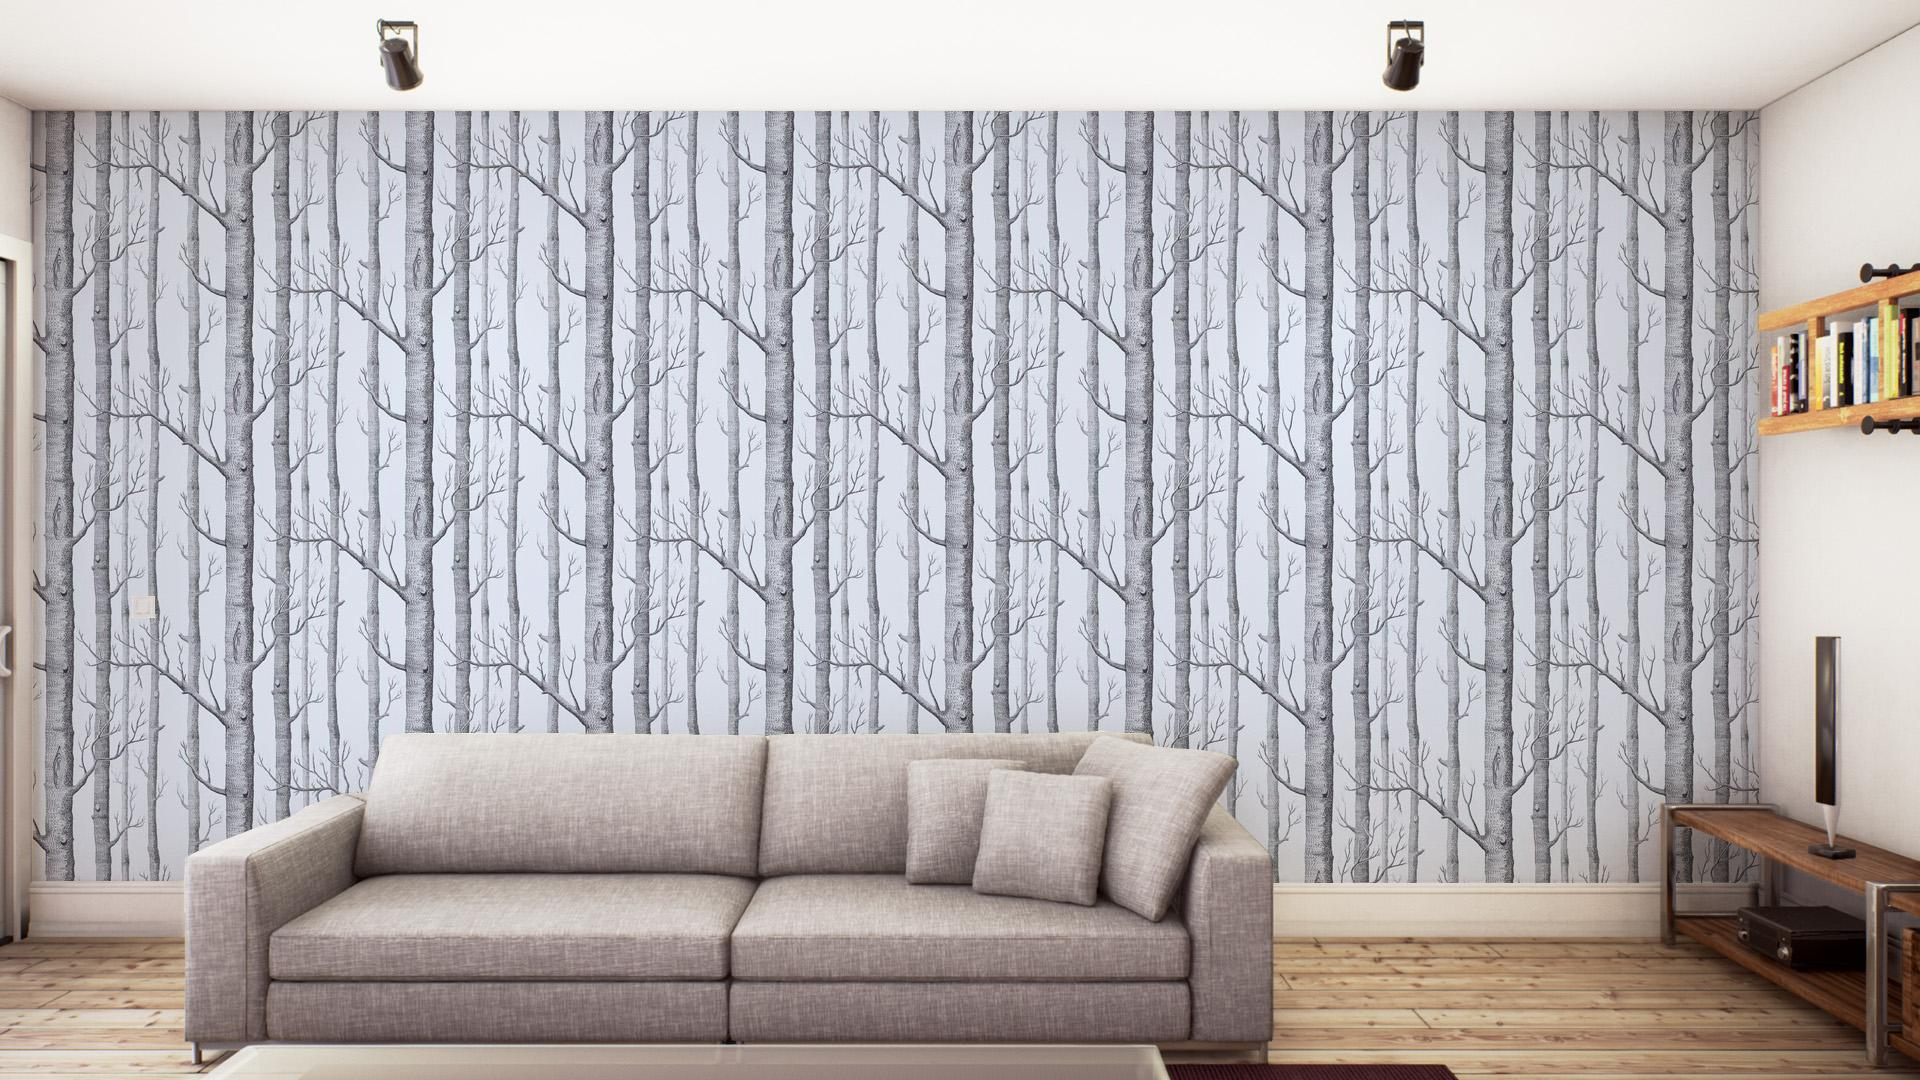 Cole Son Woods 6912150 Wallpaper Dark BrownSilver Foil 1920x1080